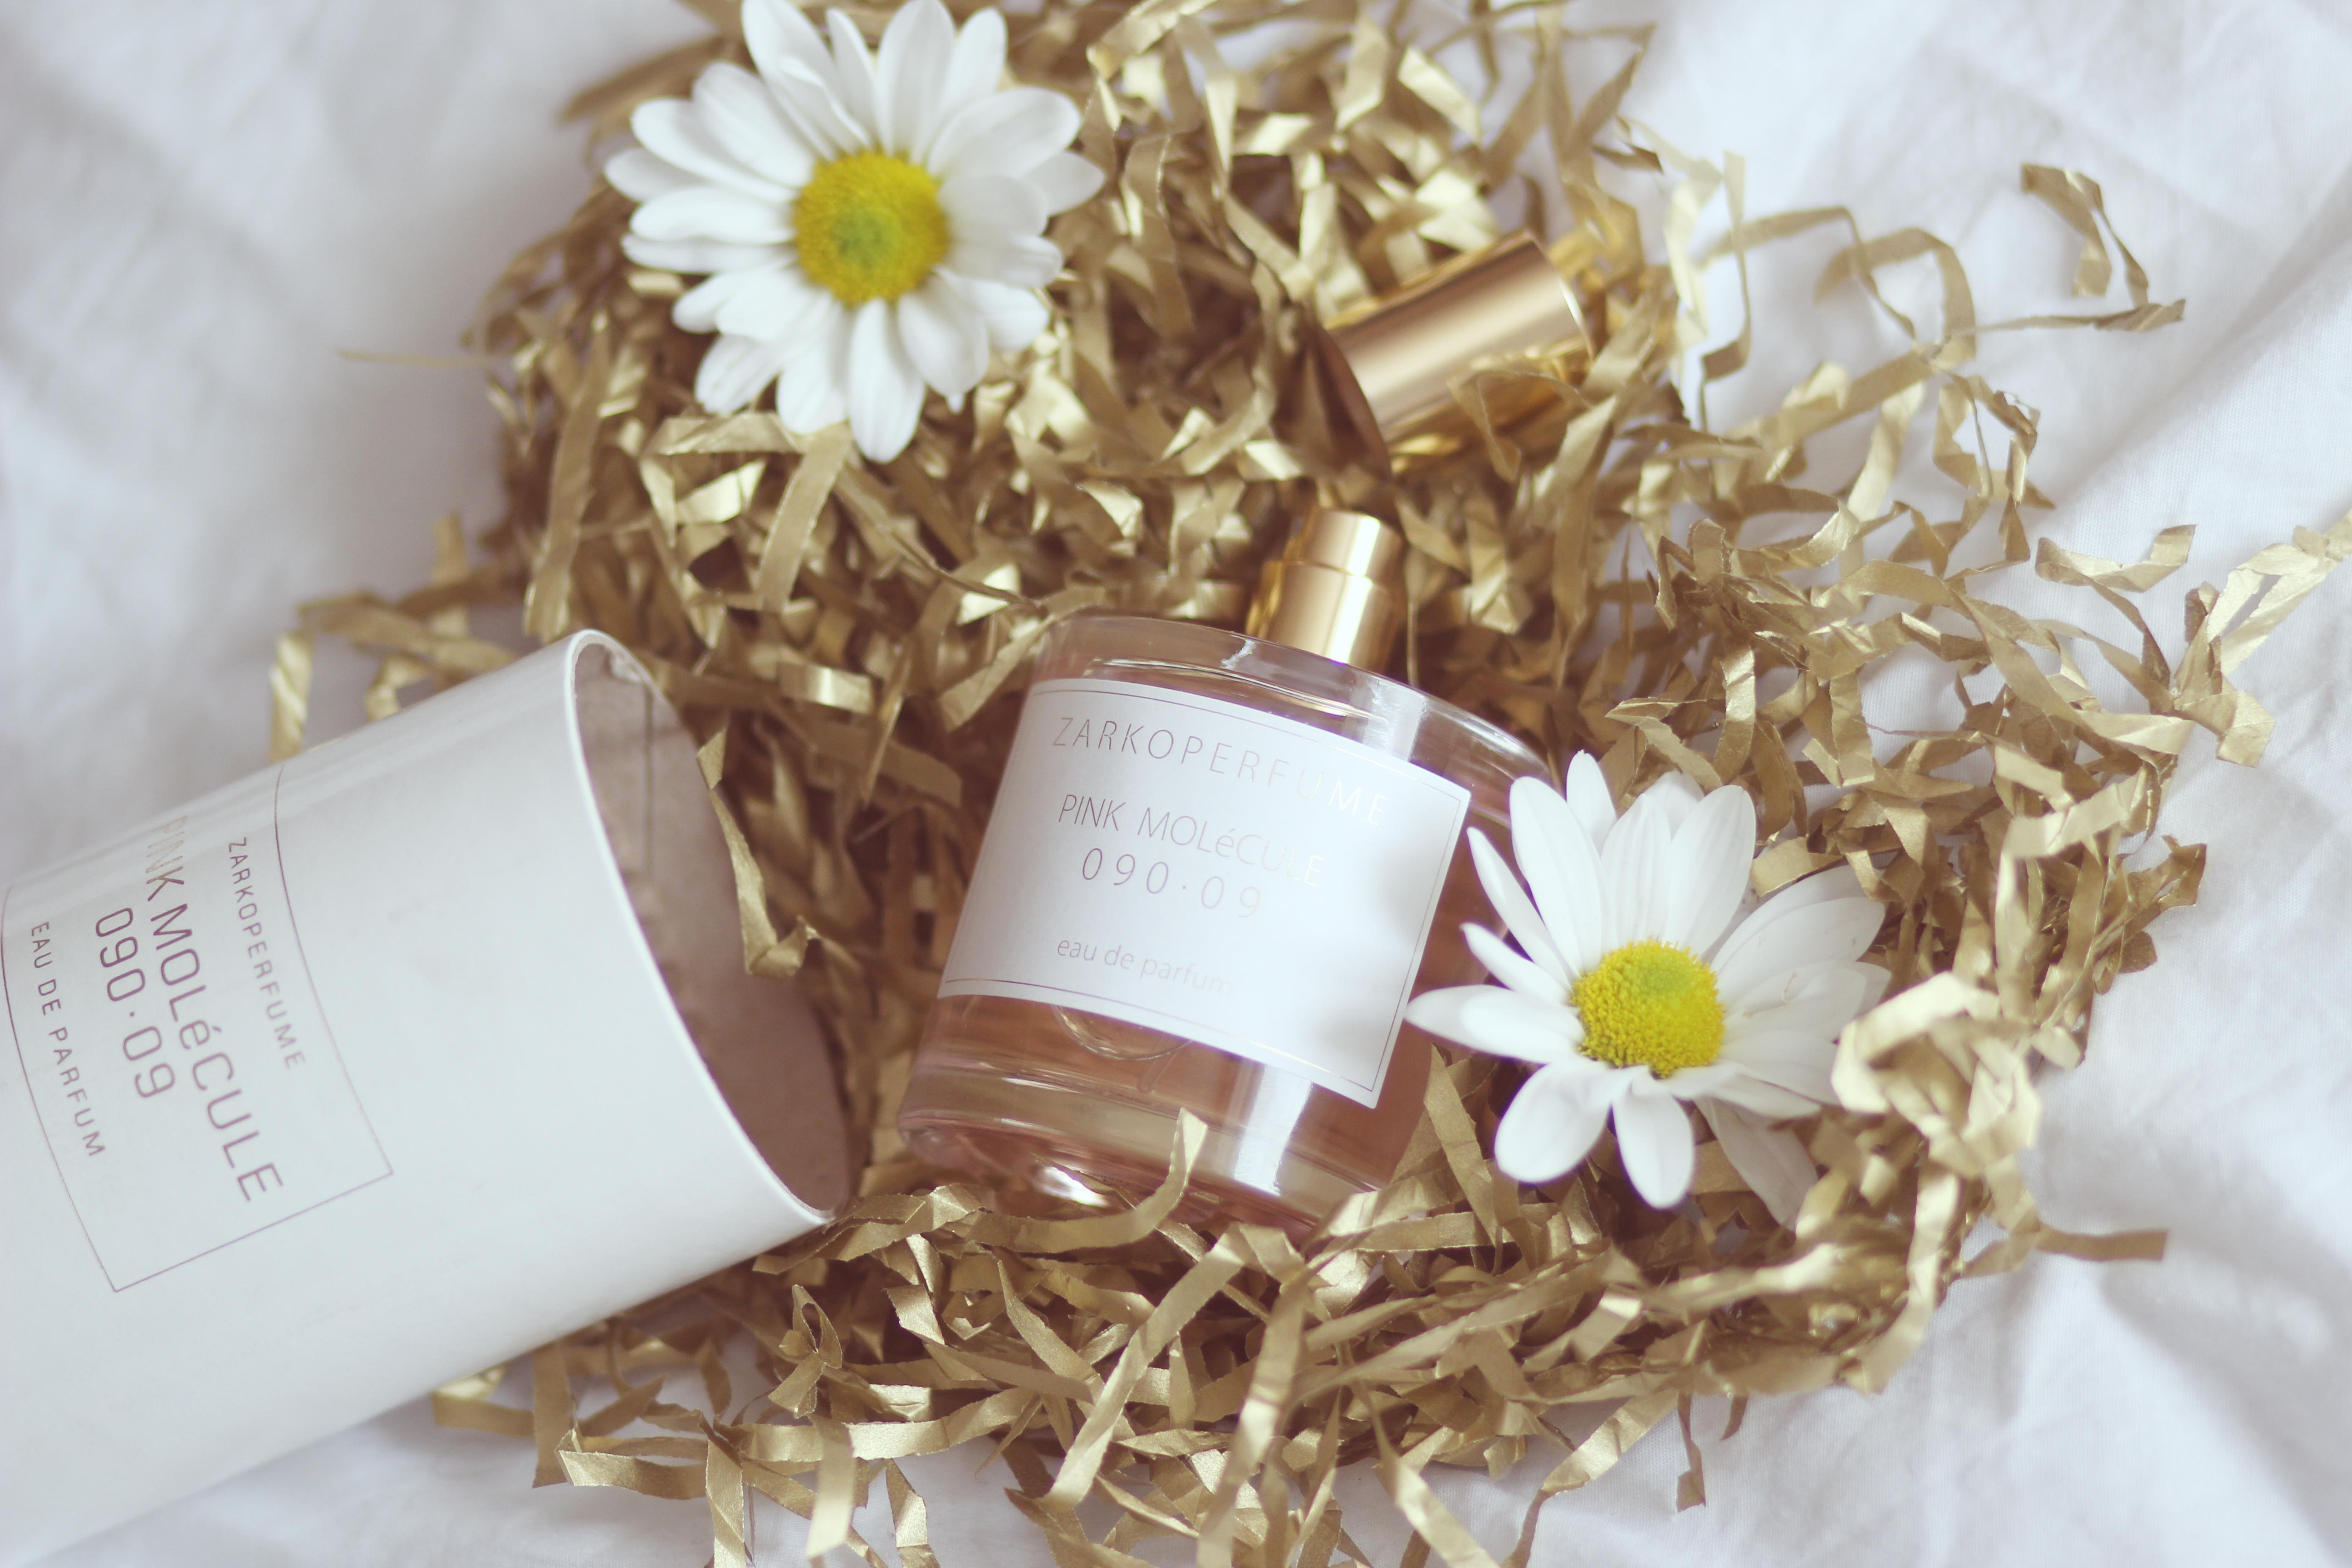 New in: Zarko Fragance via Agence de Parfumerie